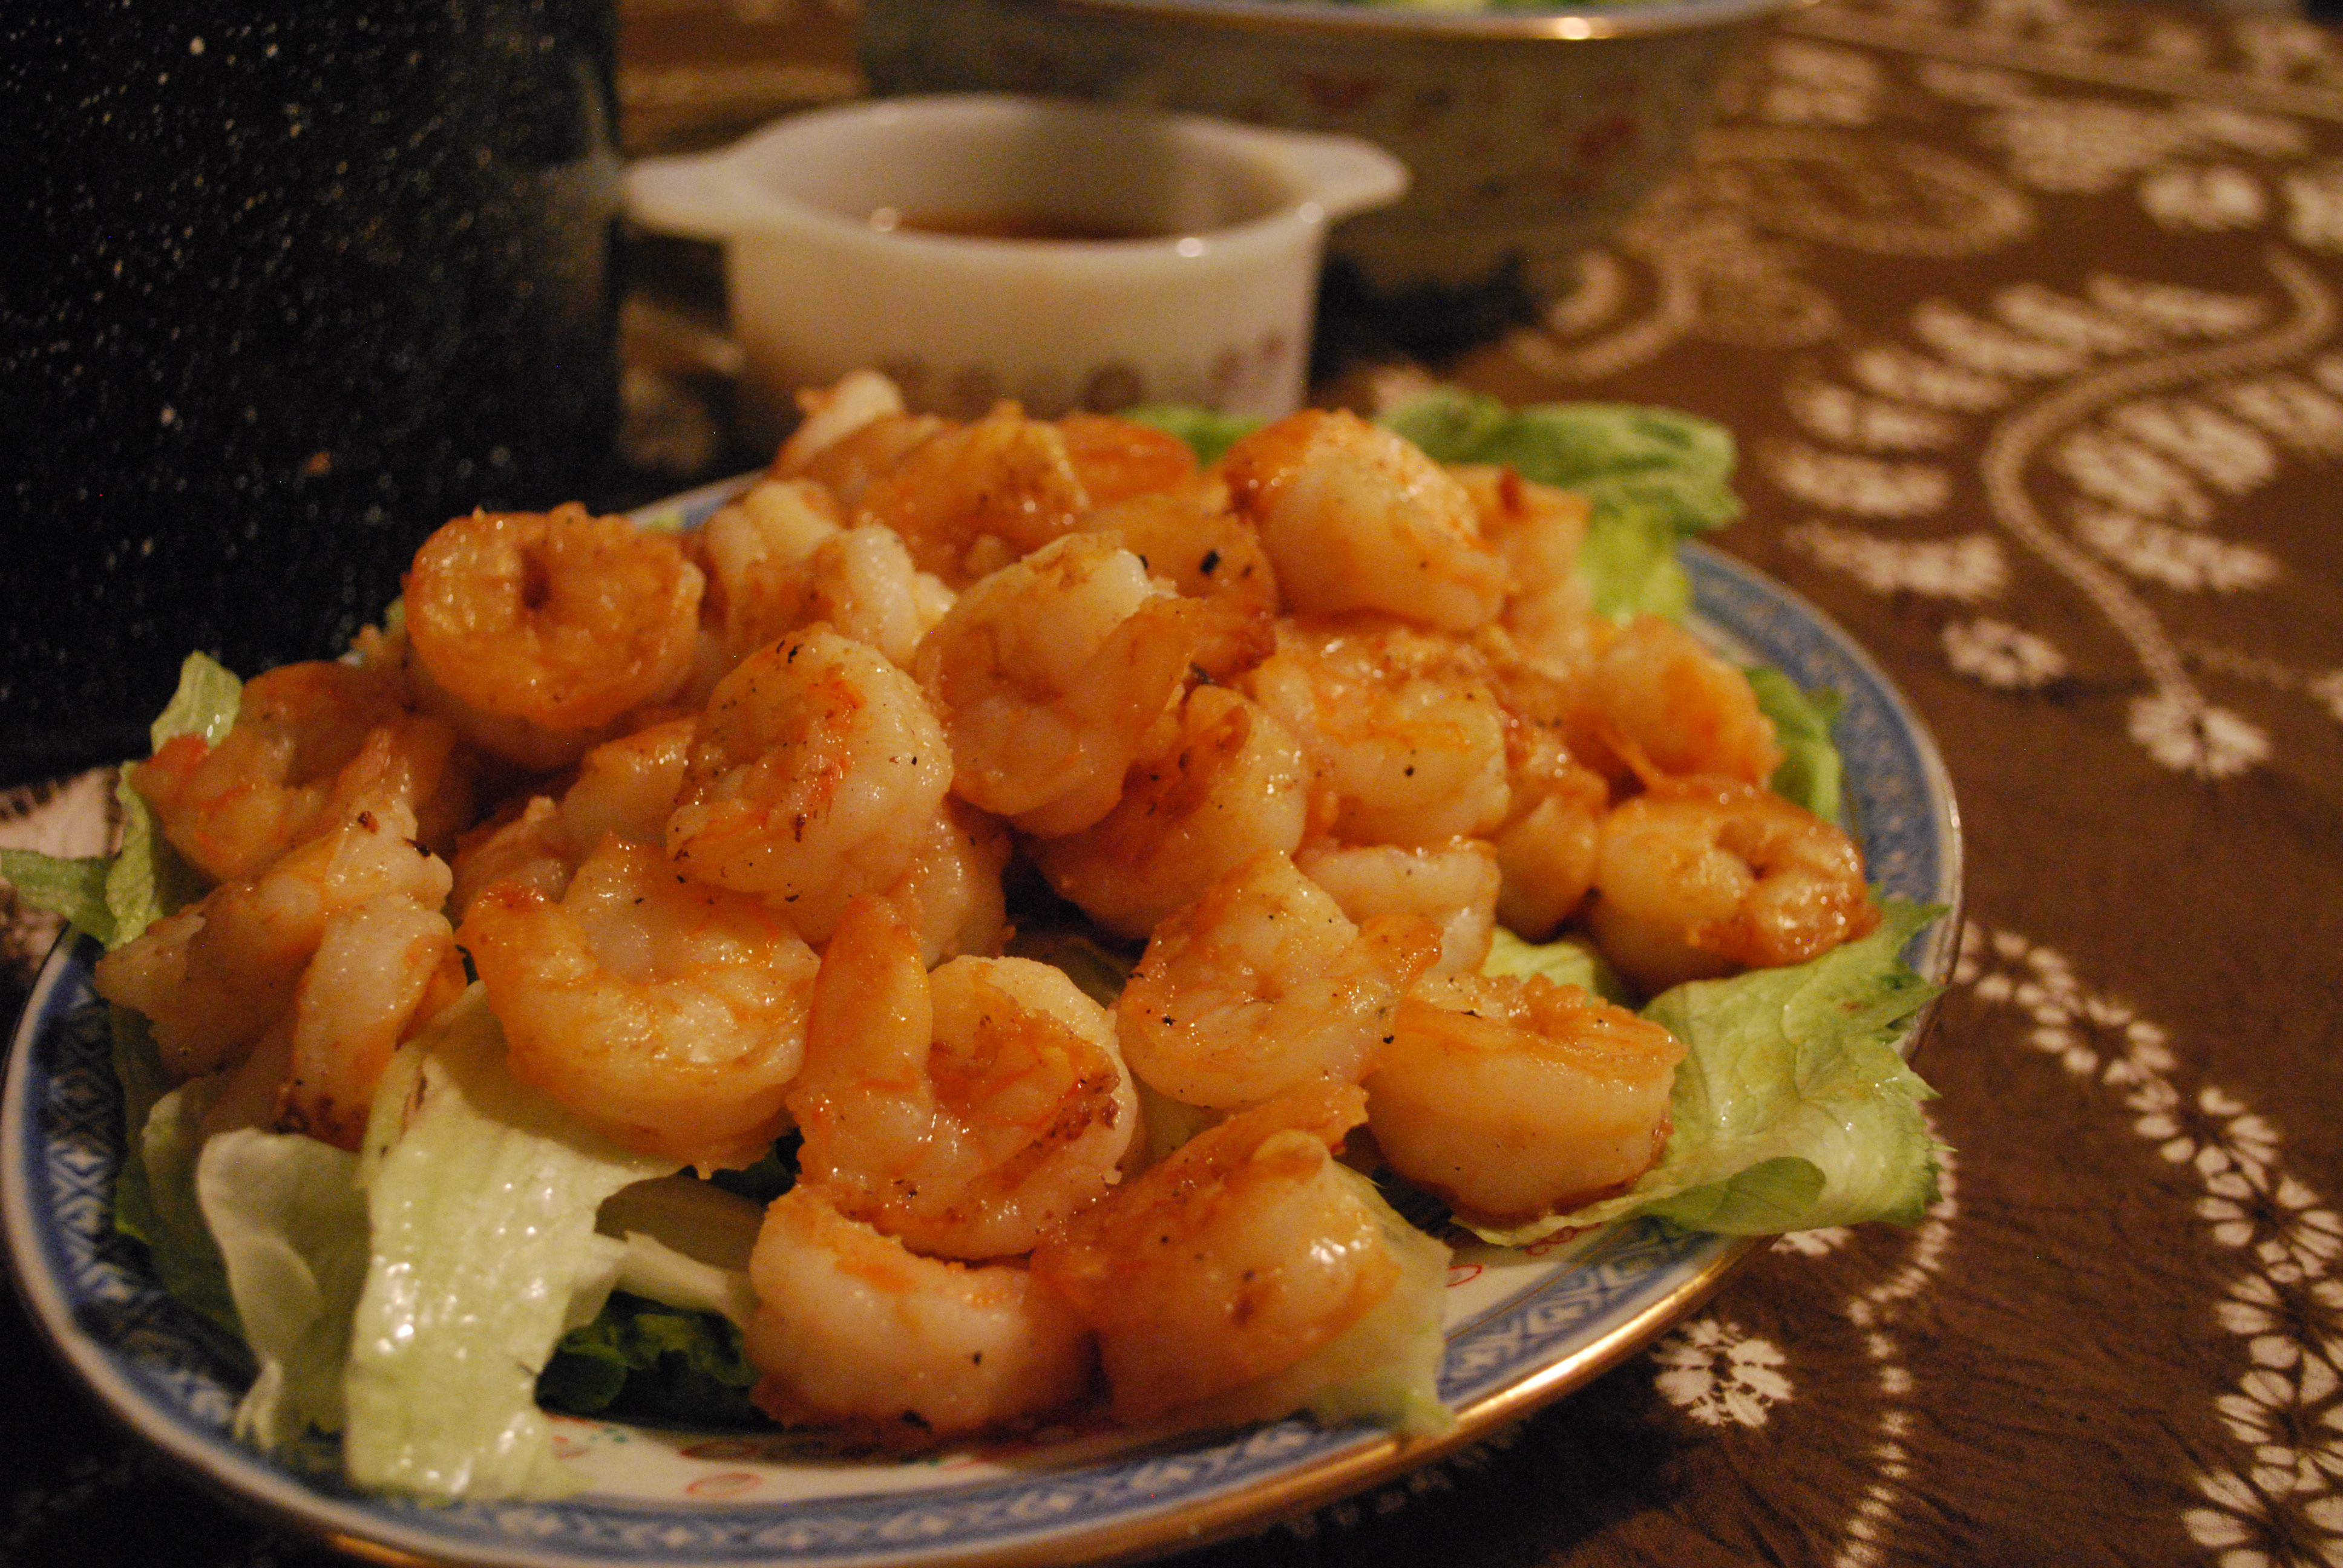 Happy shrimp stir fry cast iron happy shrimp stir fry forumfinder Gallery